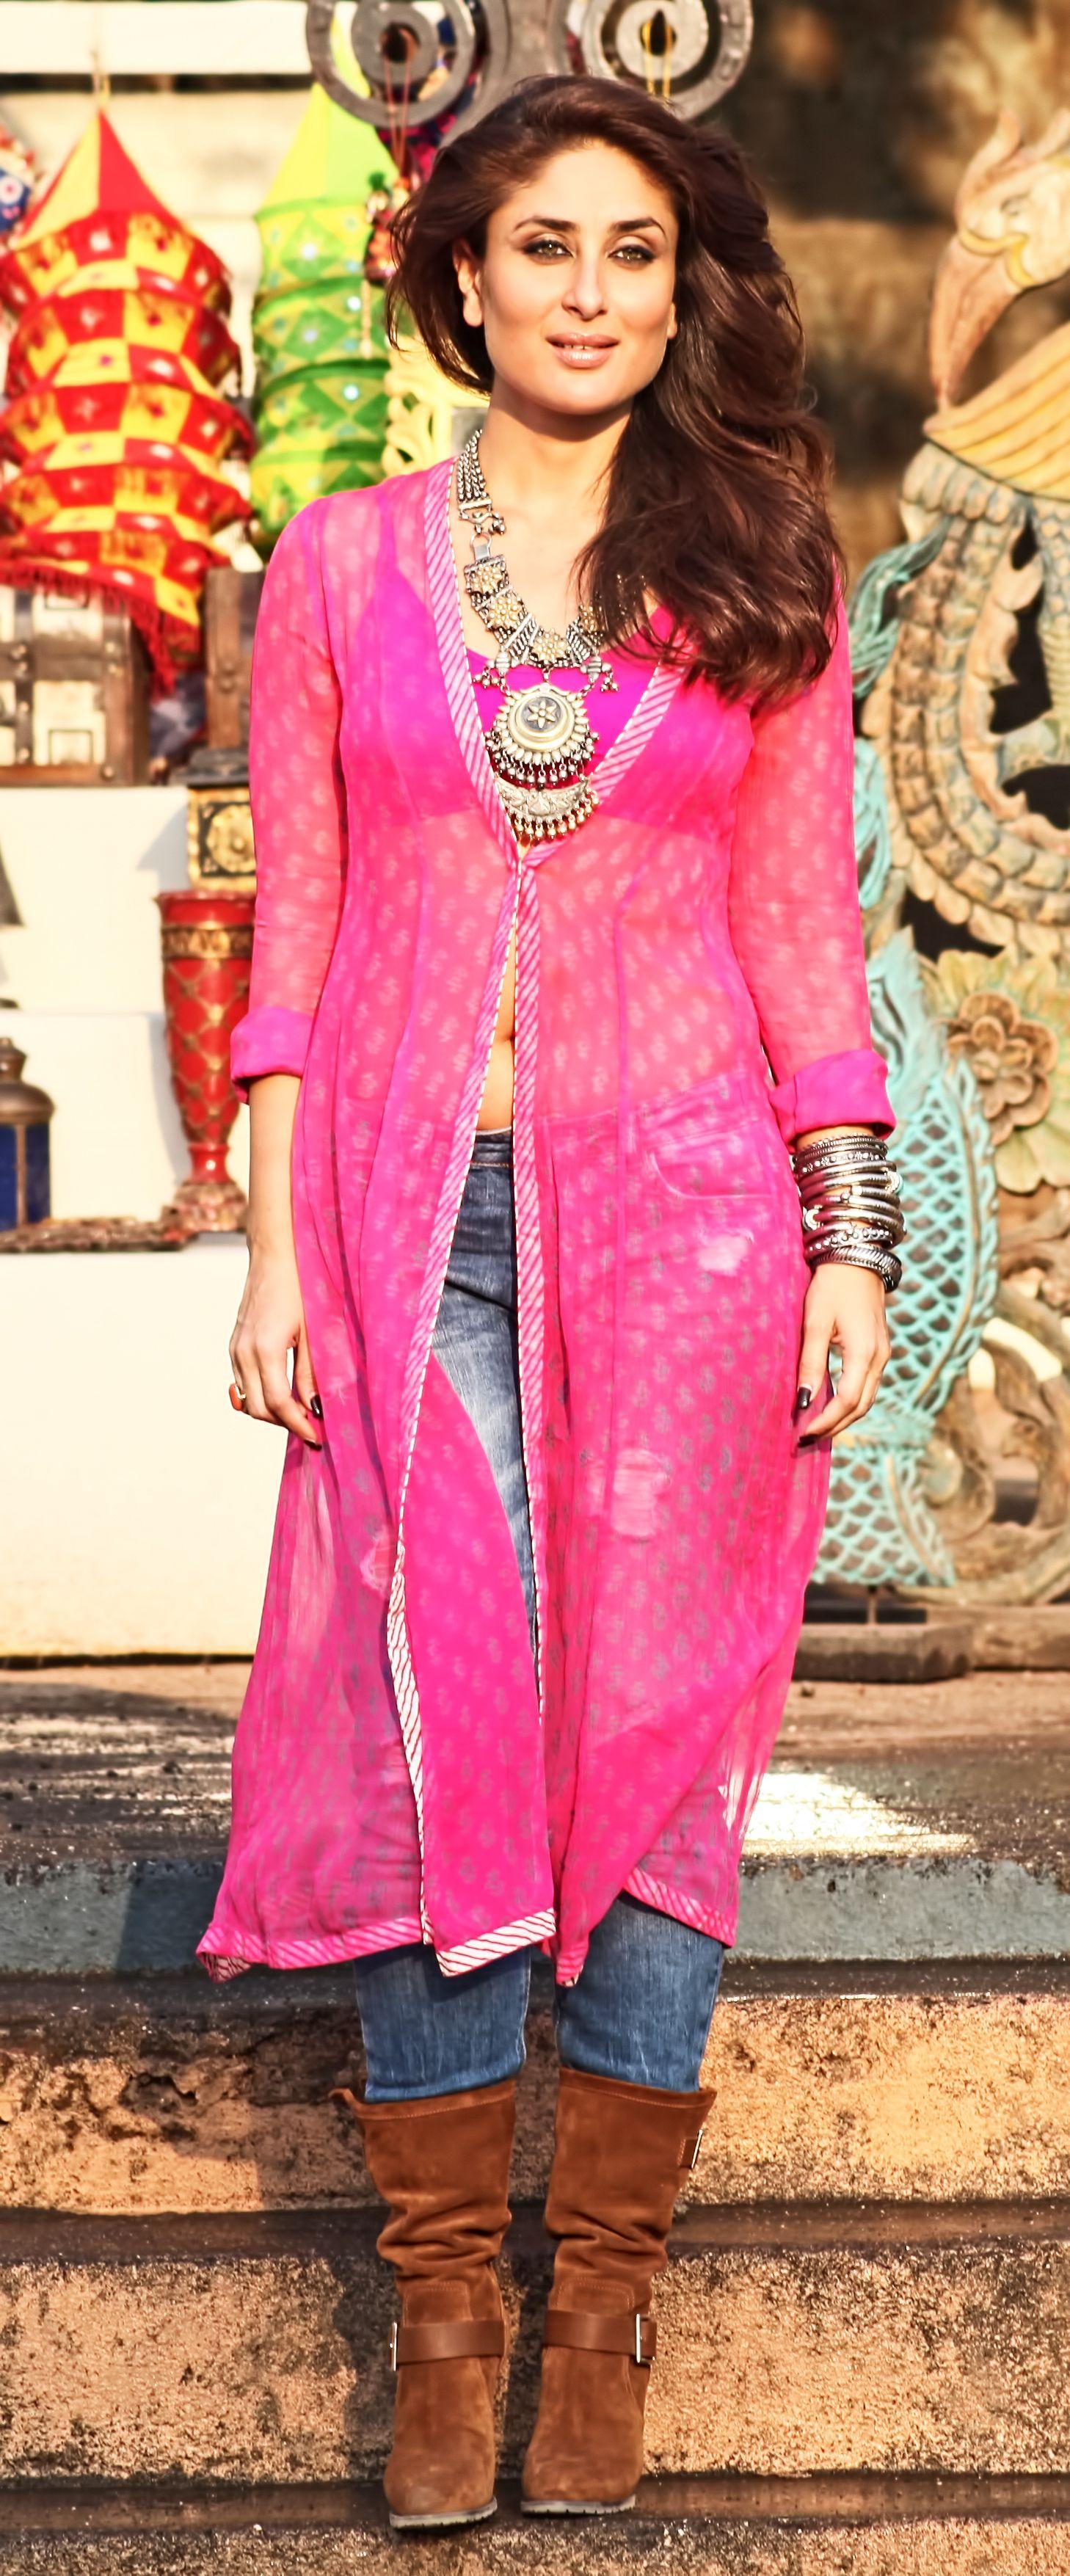 Kareena Kapoor Khan\'s look from film Gabbar | Lovely ladies of ...